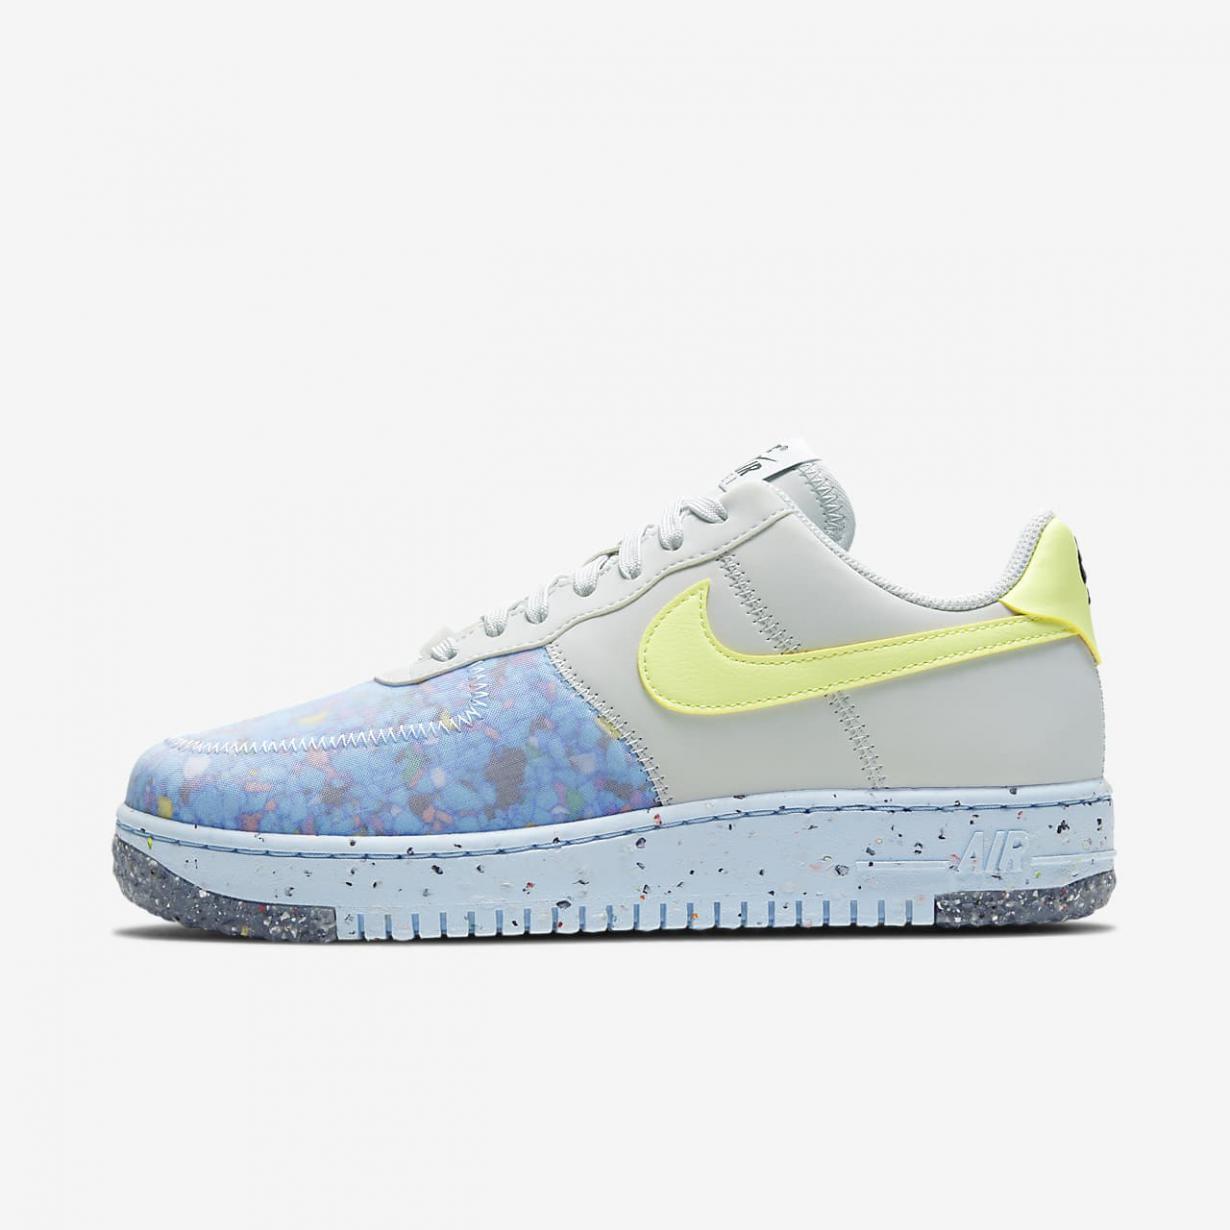 Lifestyle Femme   Air Force 1 Crater Platine pur/Blanc sommet/Chambray bleu/Jaune pâle électrique   Nike < Gooddaytricities